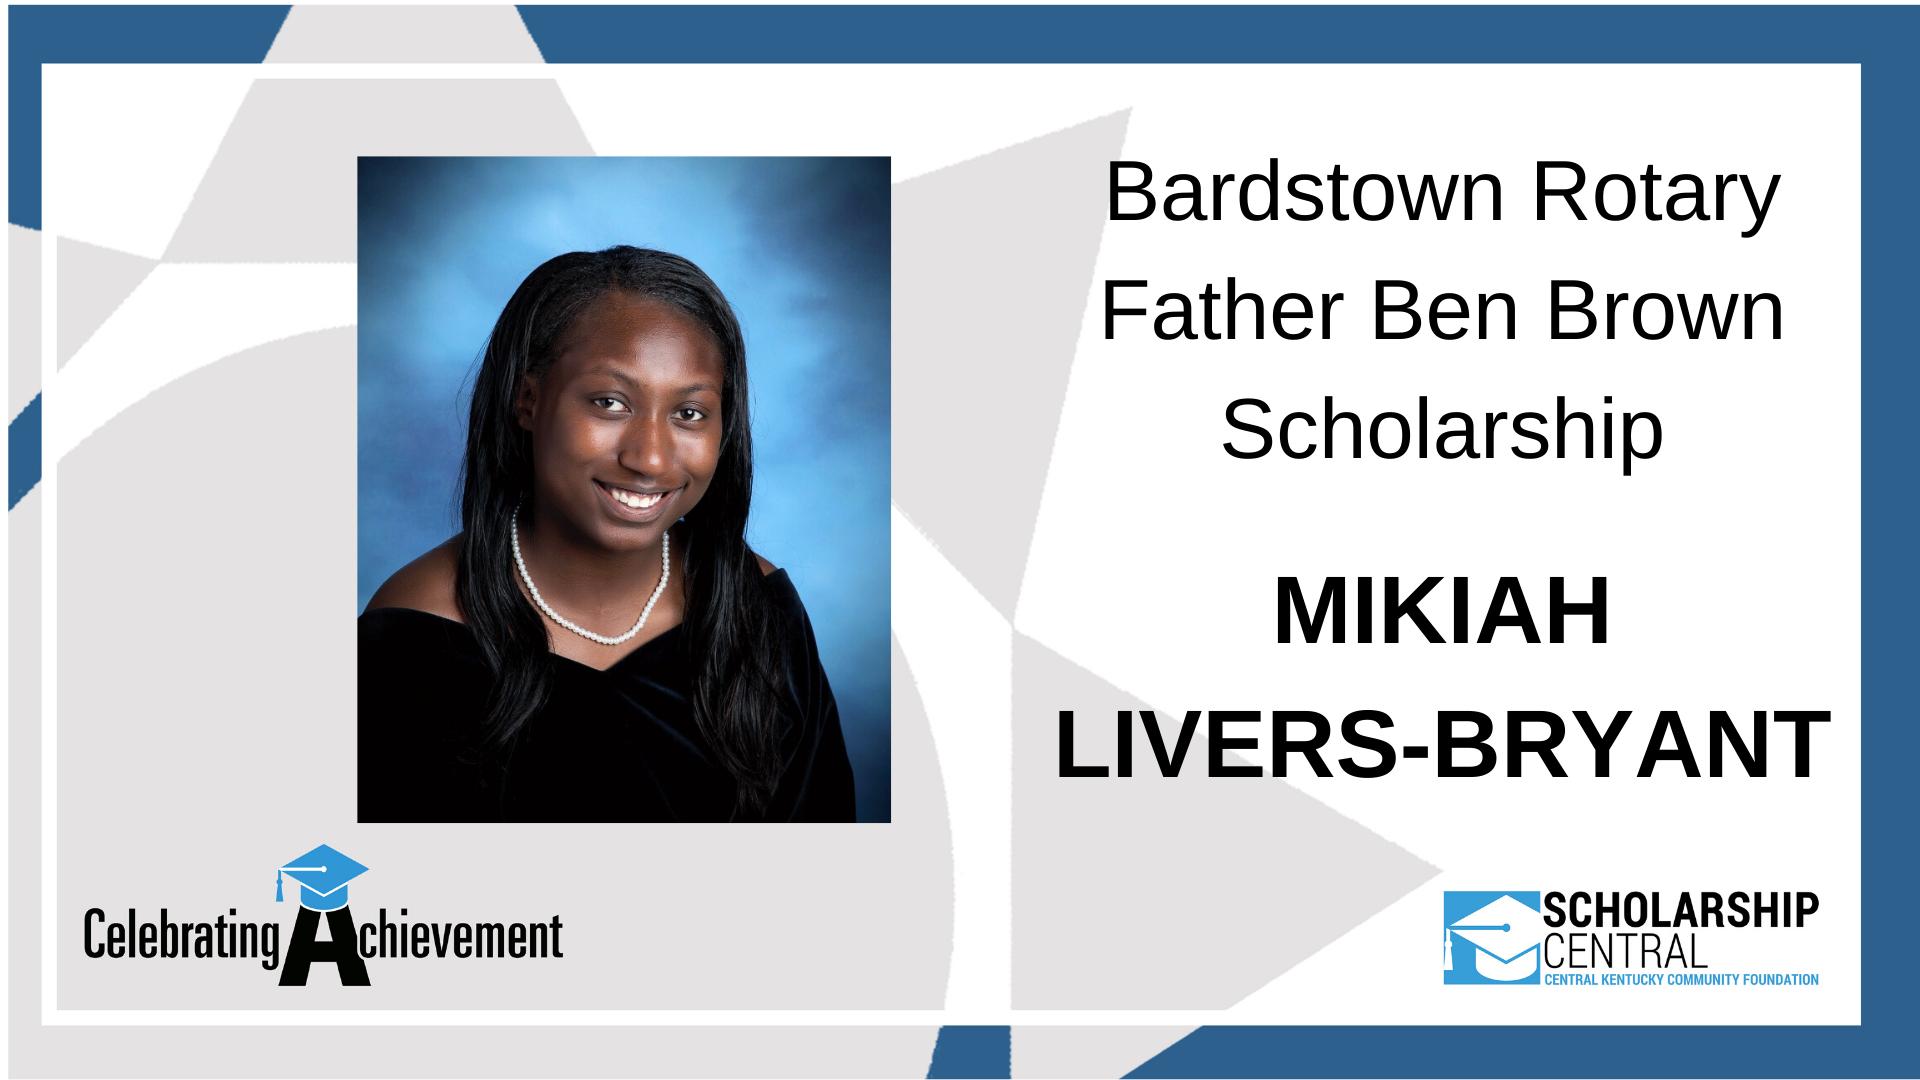 Bardstown Father Ben Brown Scholarship